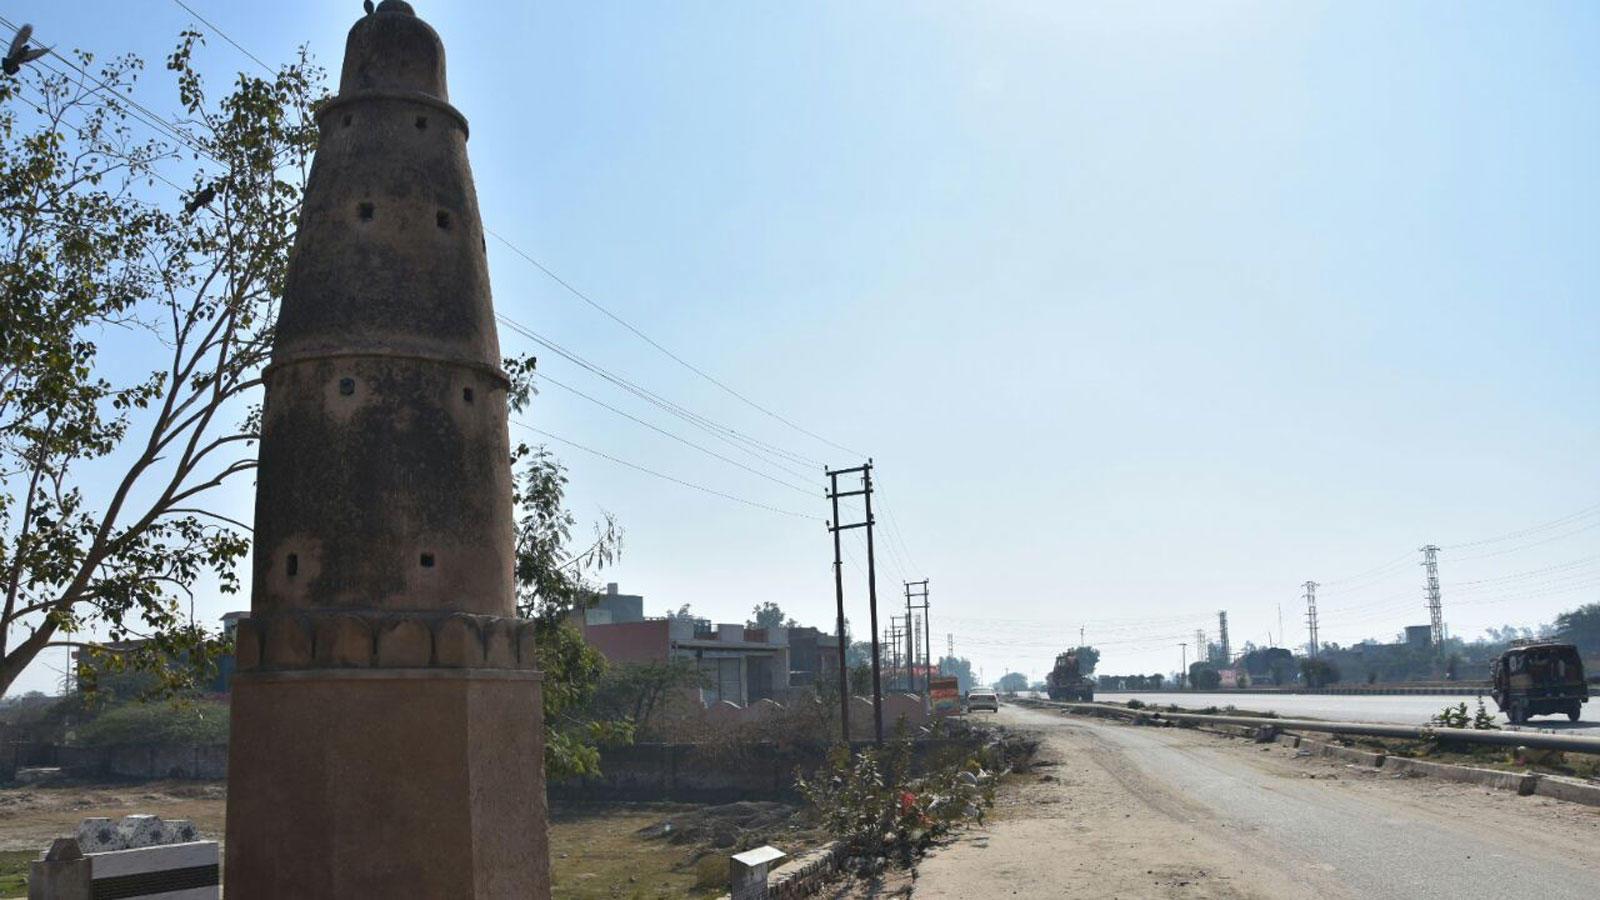 Kos minar in Chhata near NH-2 in Mathura, UP (Photo: Anil Agarwal)